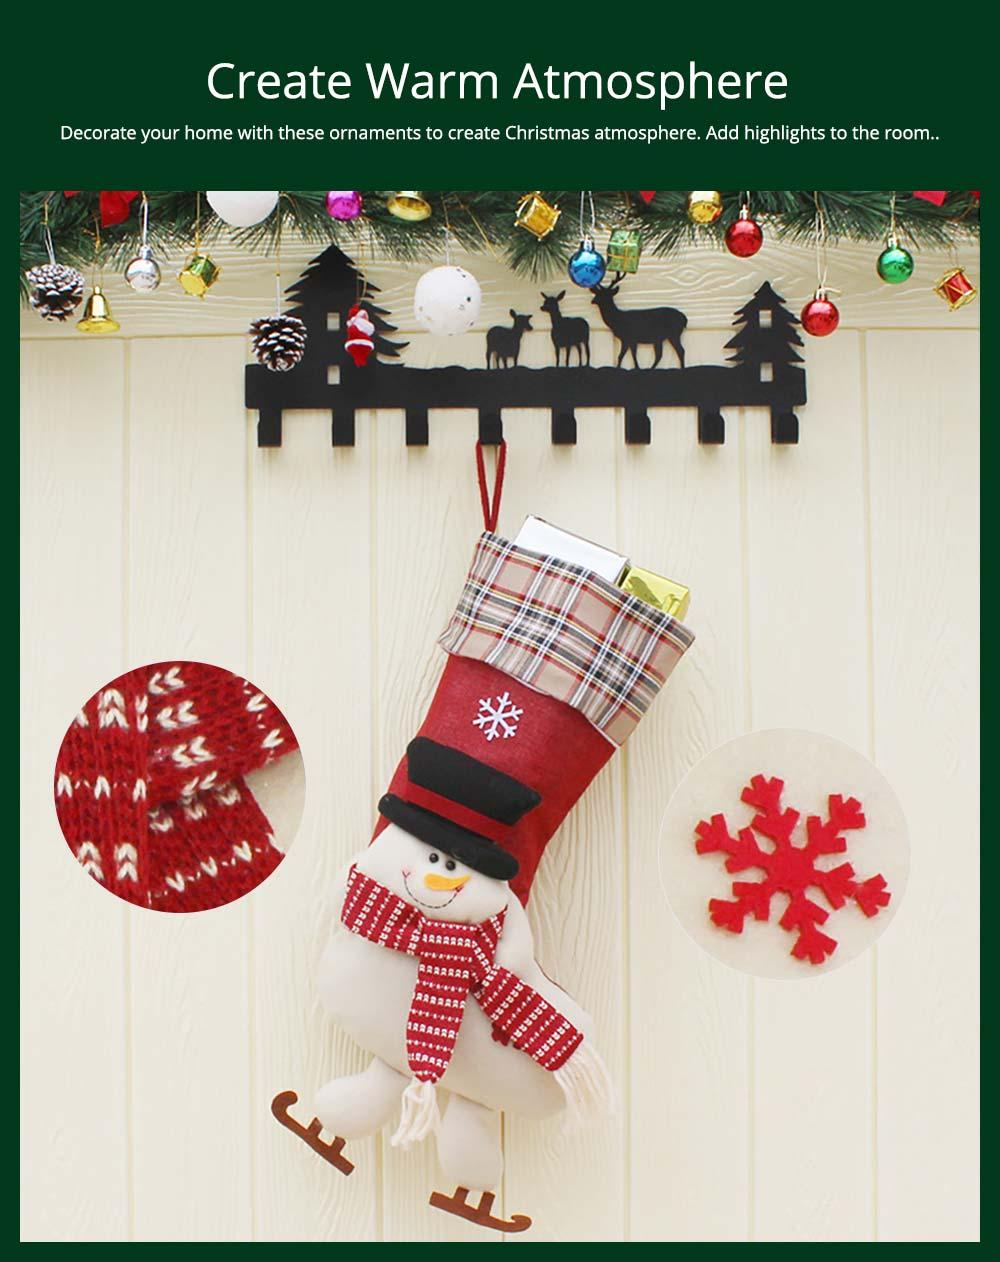 Christmas Decoration Socks Big Size, Gift Sack Plaids Santa Claus Reindeer Snowman Home Hanging Decor Children 15